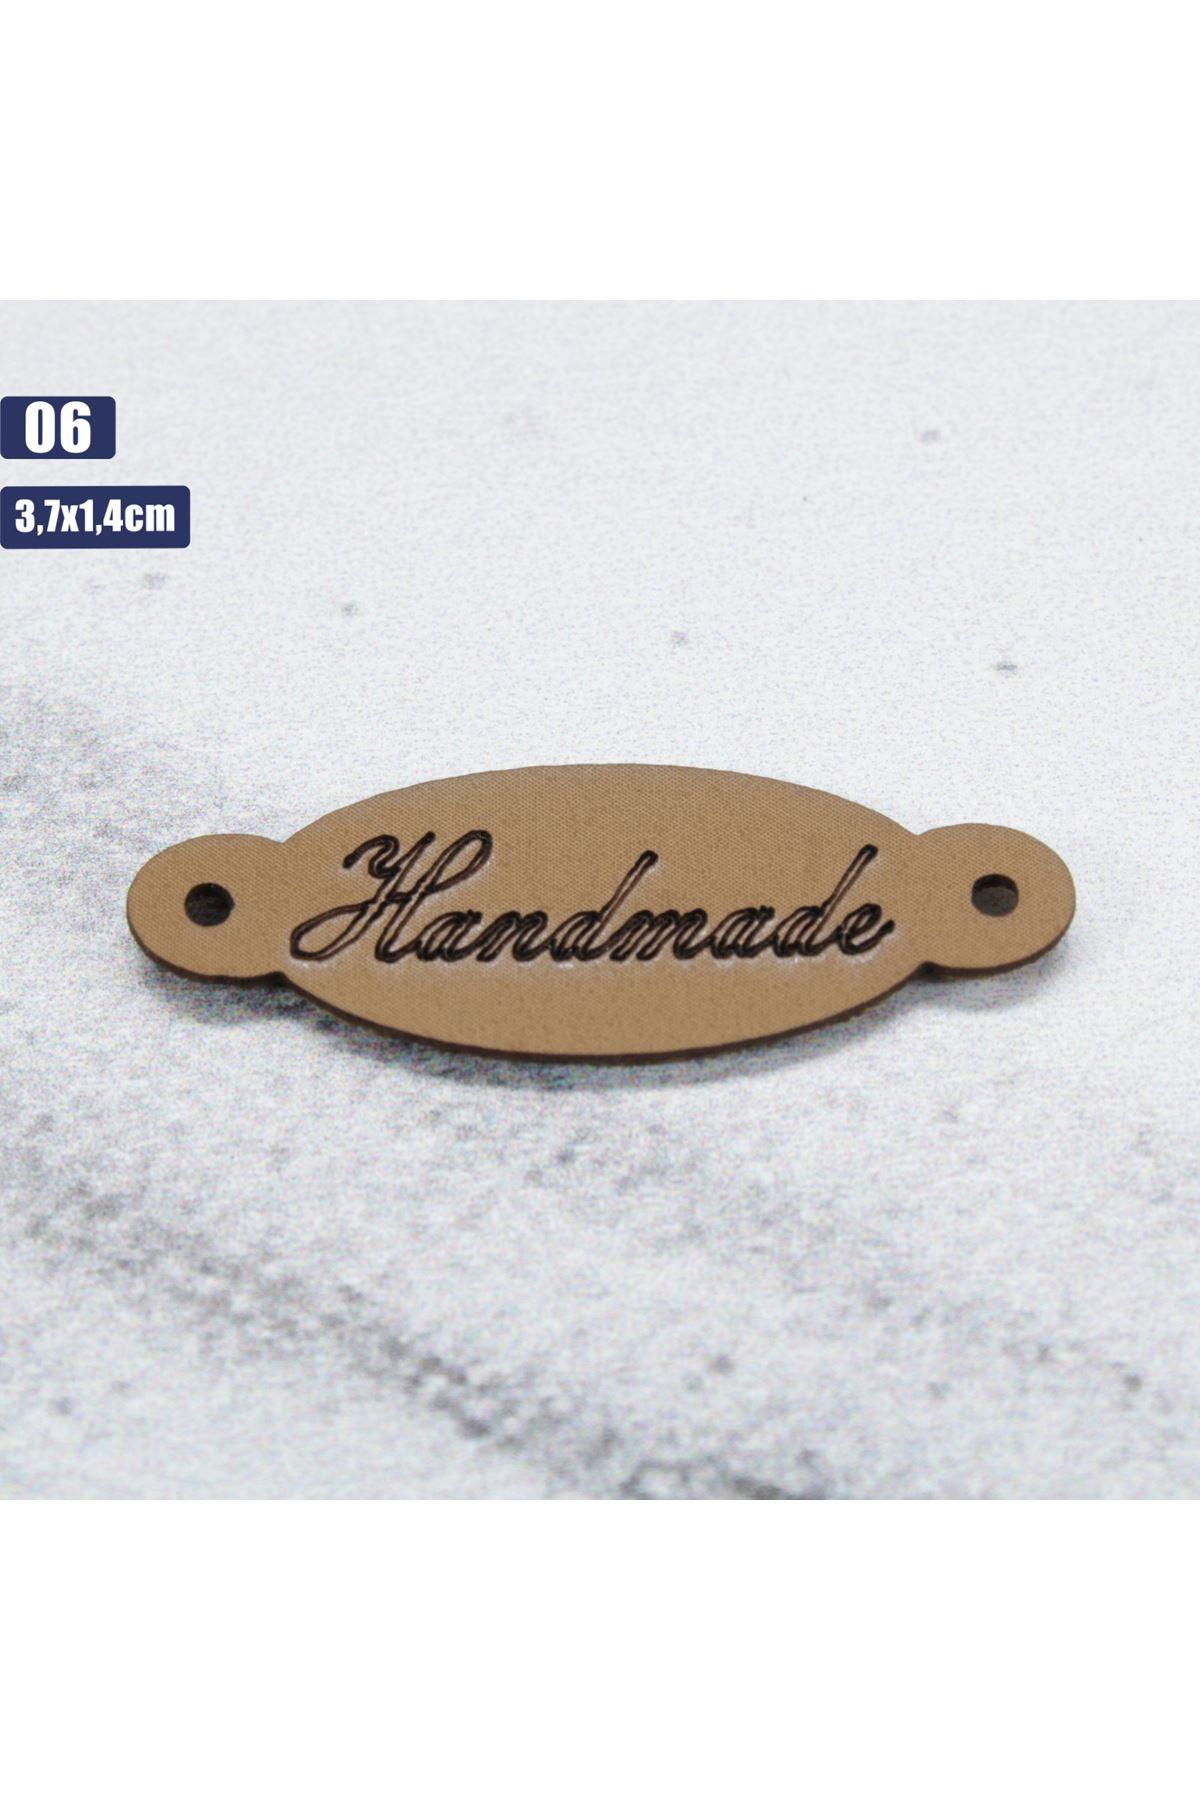 Deri Handmade Etiketi 06